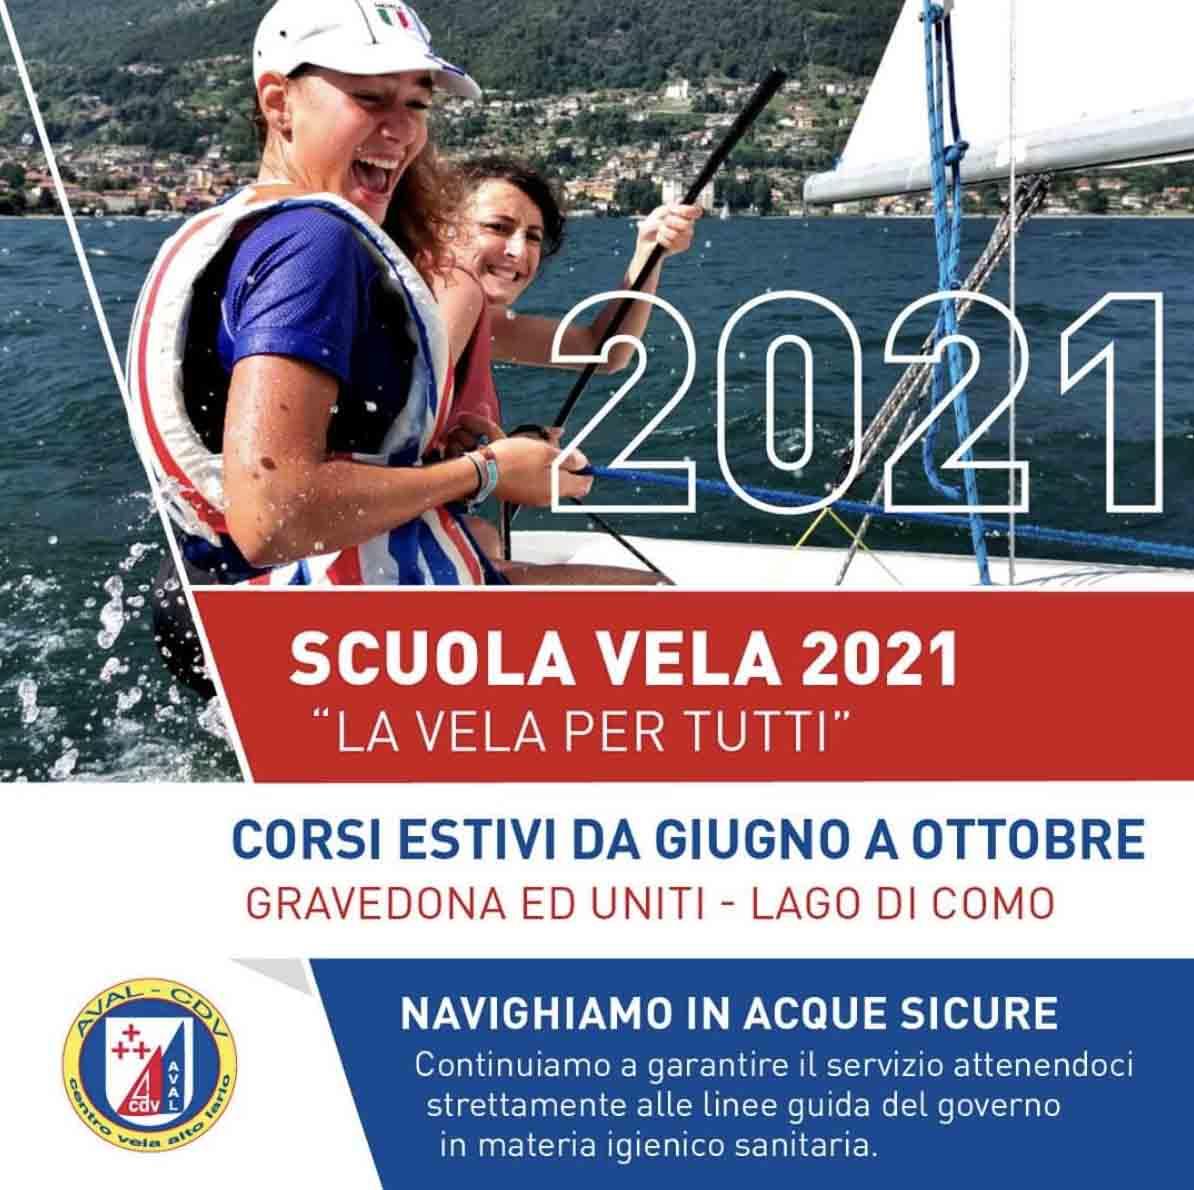 Scuola Vela 2021